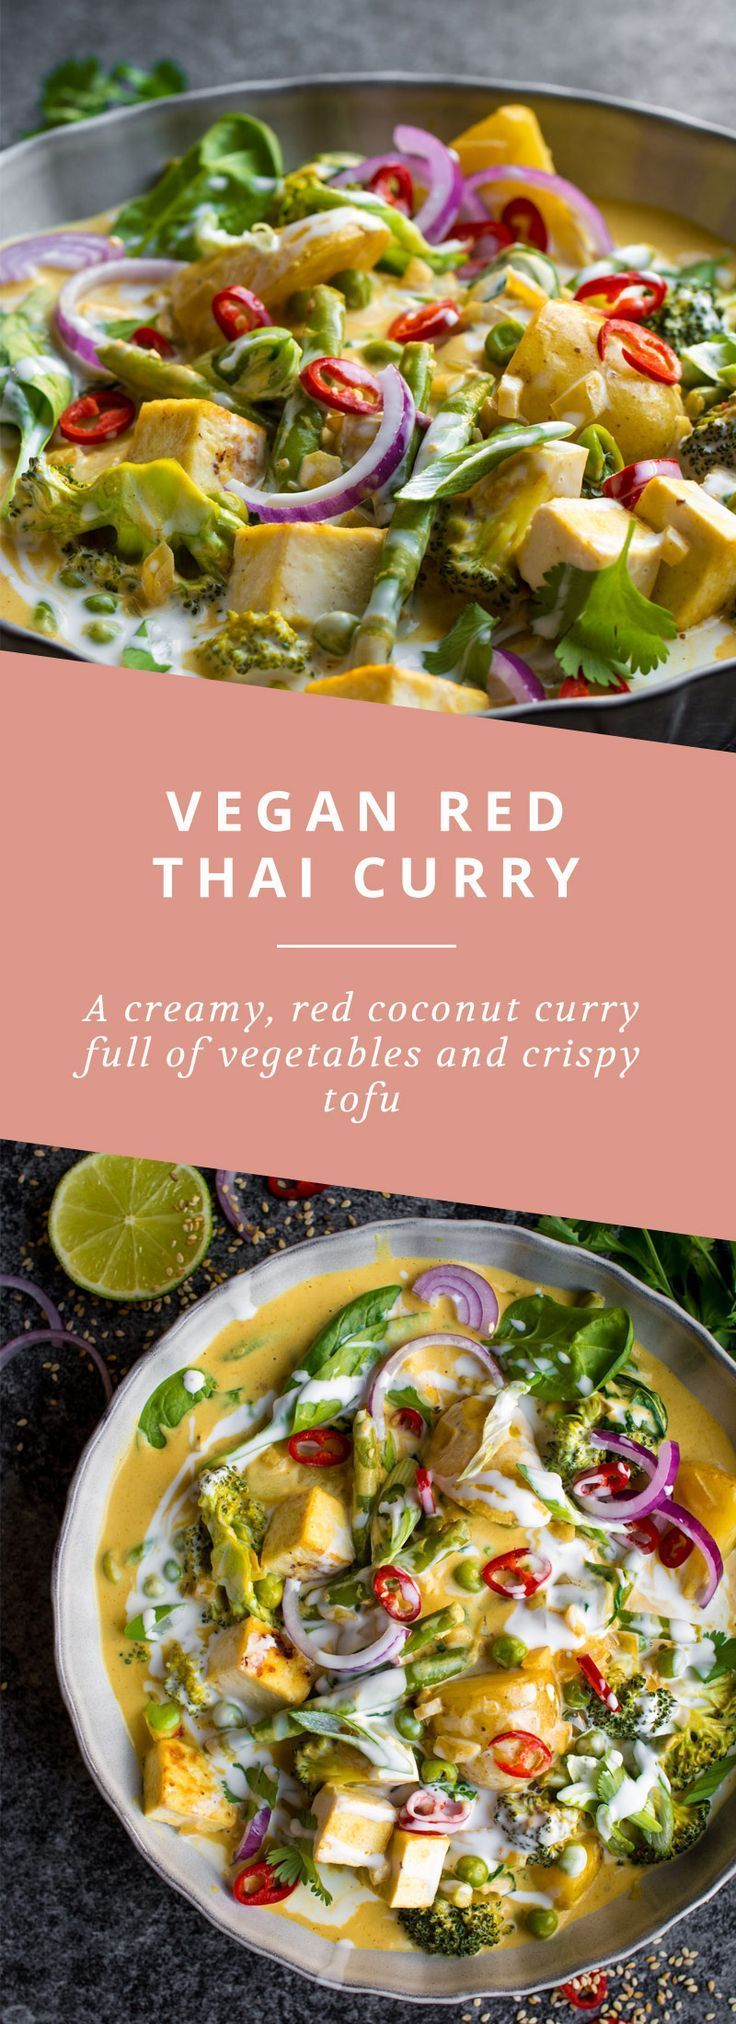 Vegan Red Thai Curry full of vegetables and crispy tofu